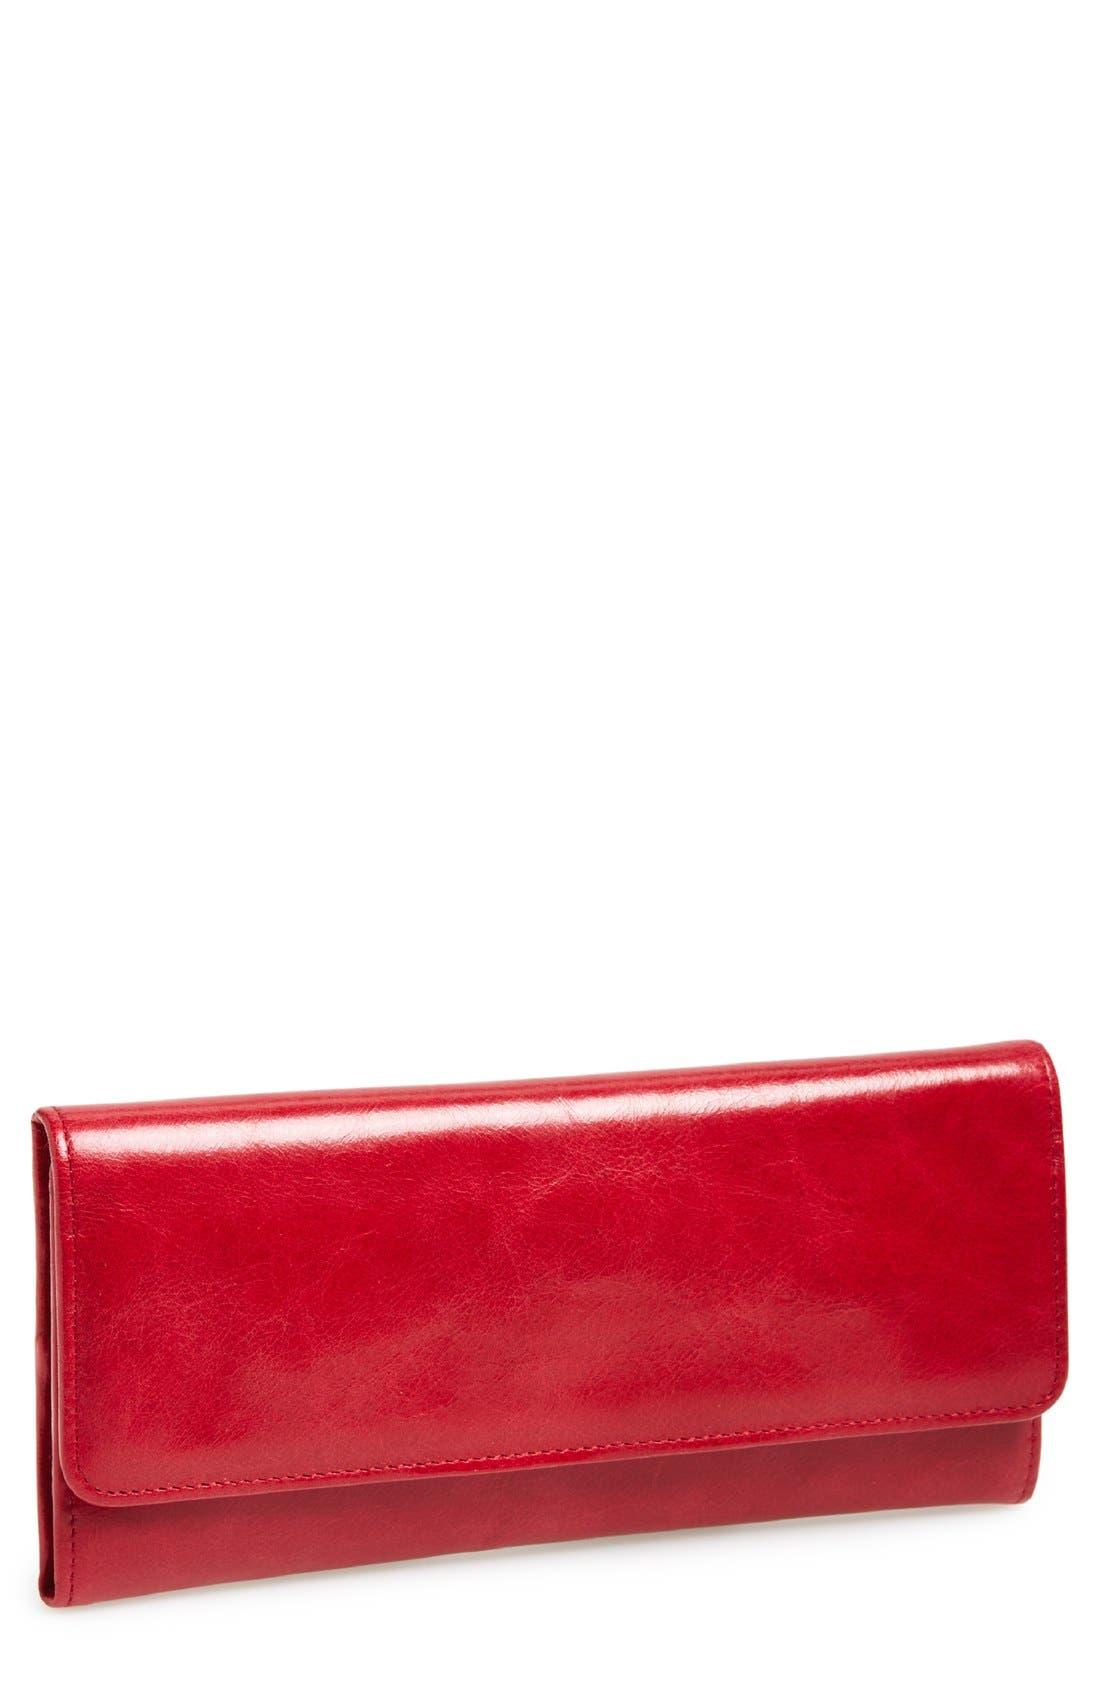 'Sadie' Leather Wallet,                             Main thumbnail 55, color,